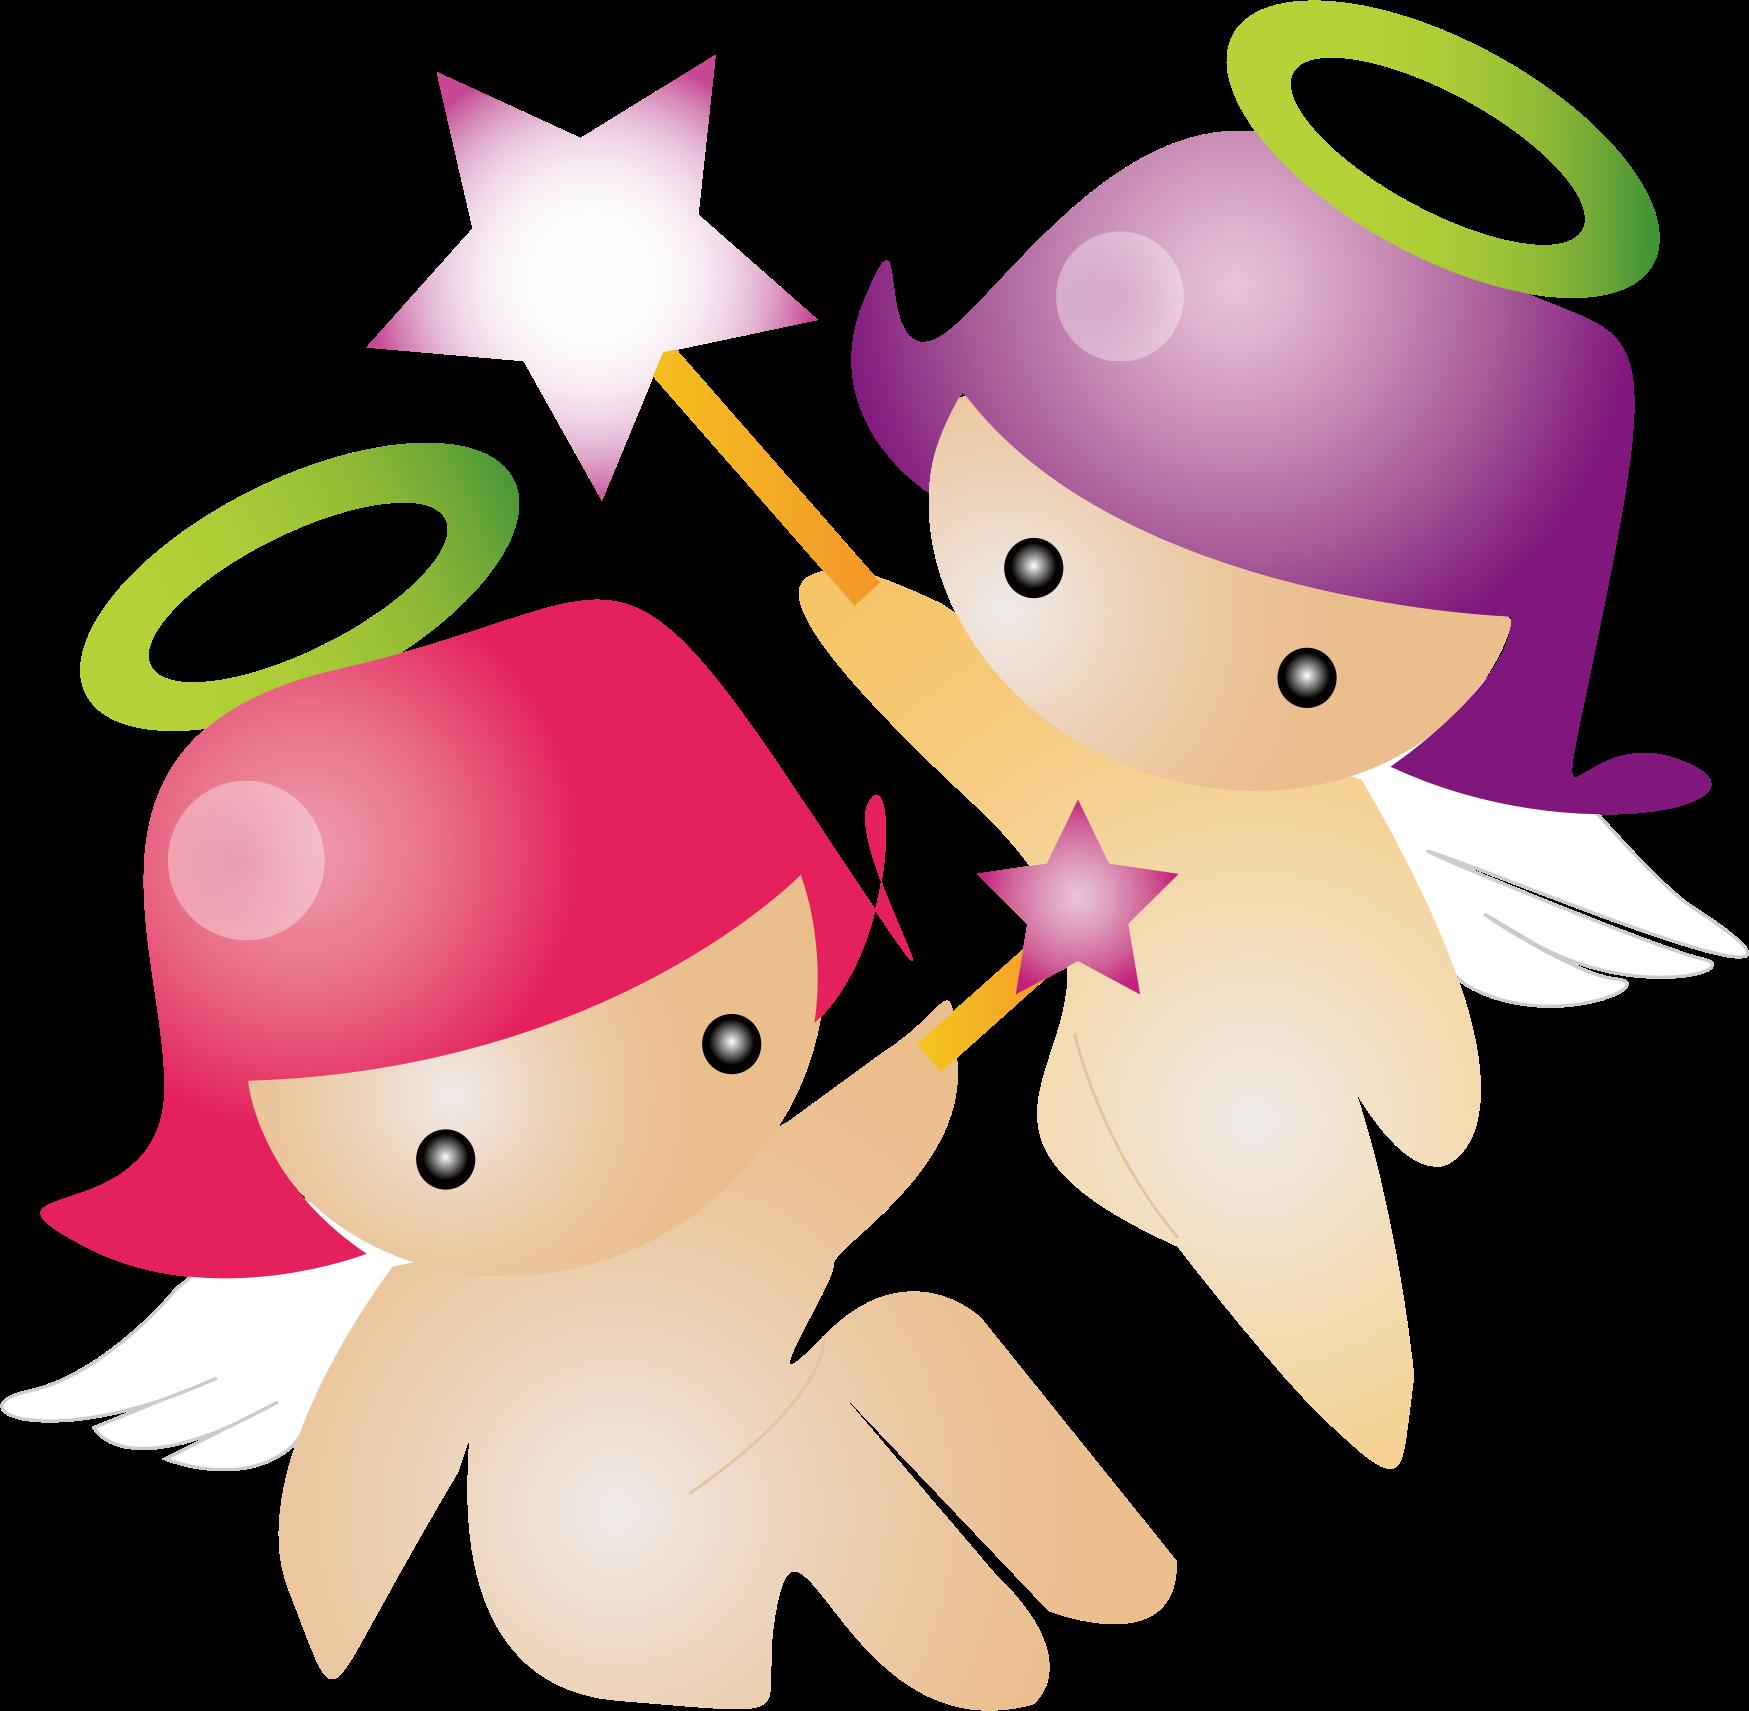 Знак зодиака близнецы детский картинки